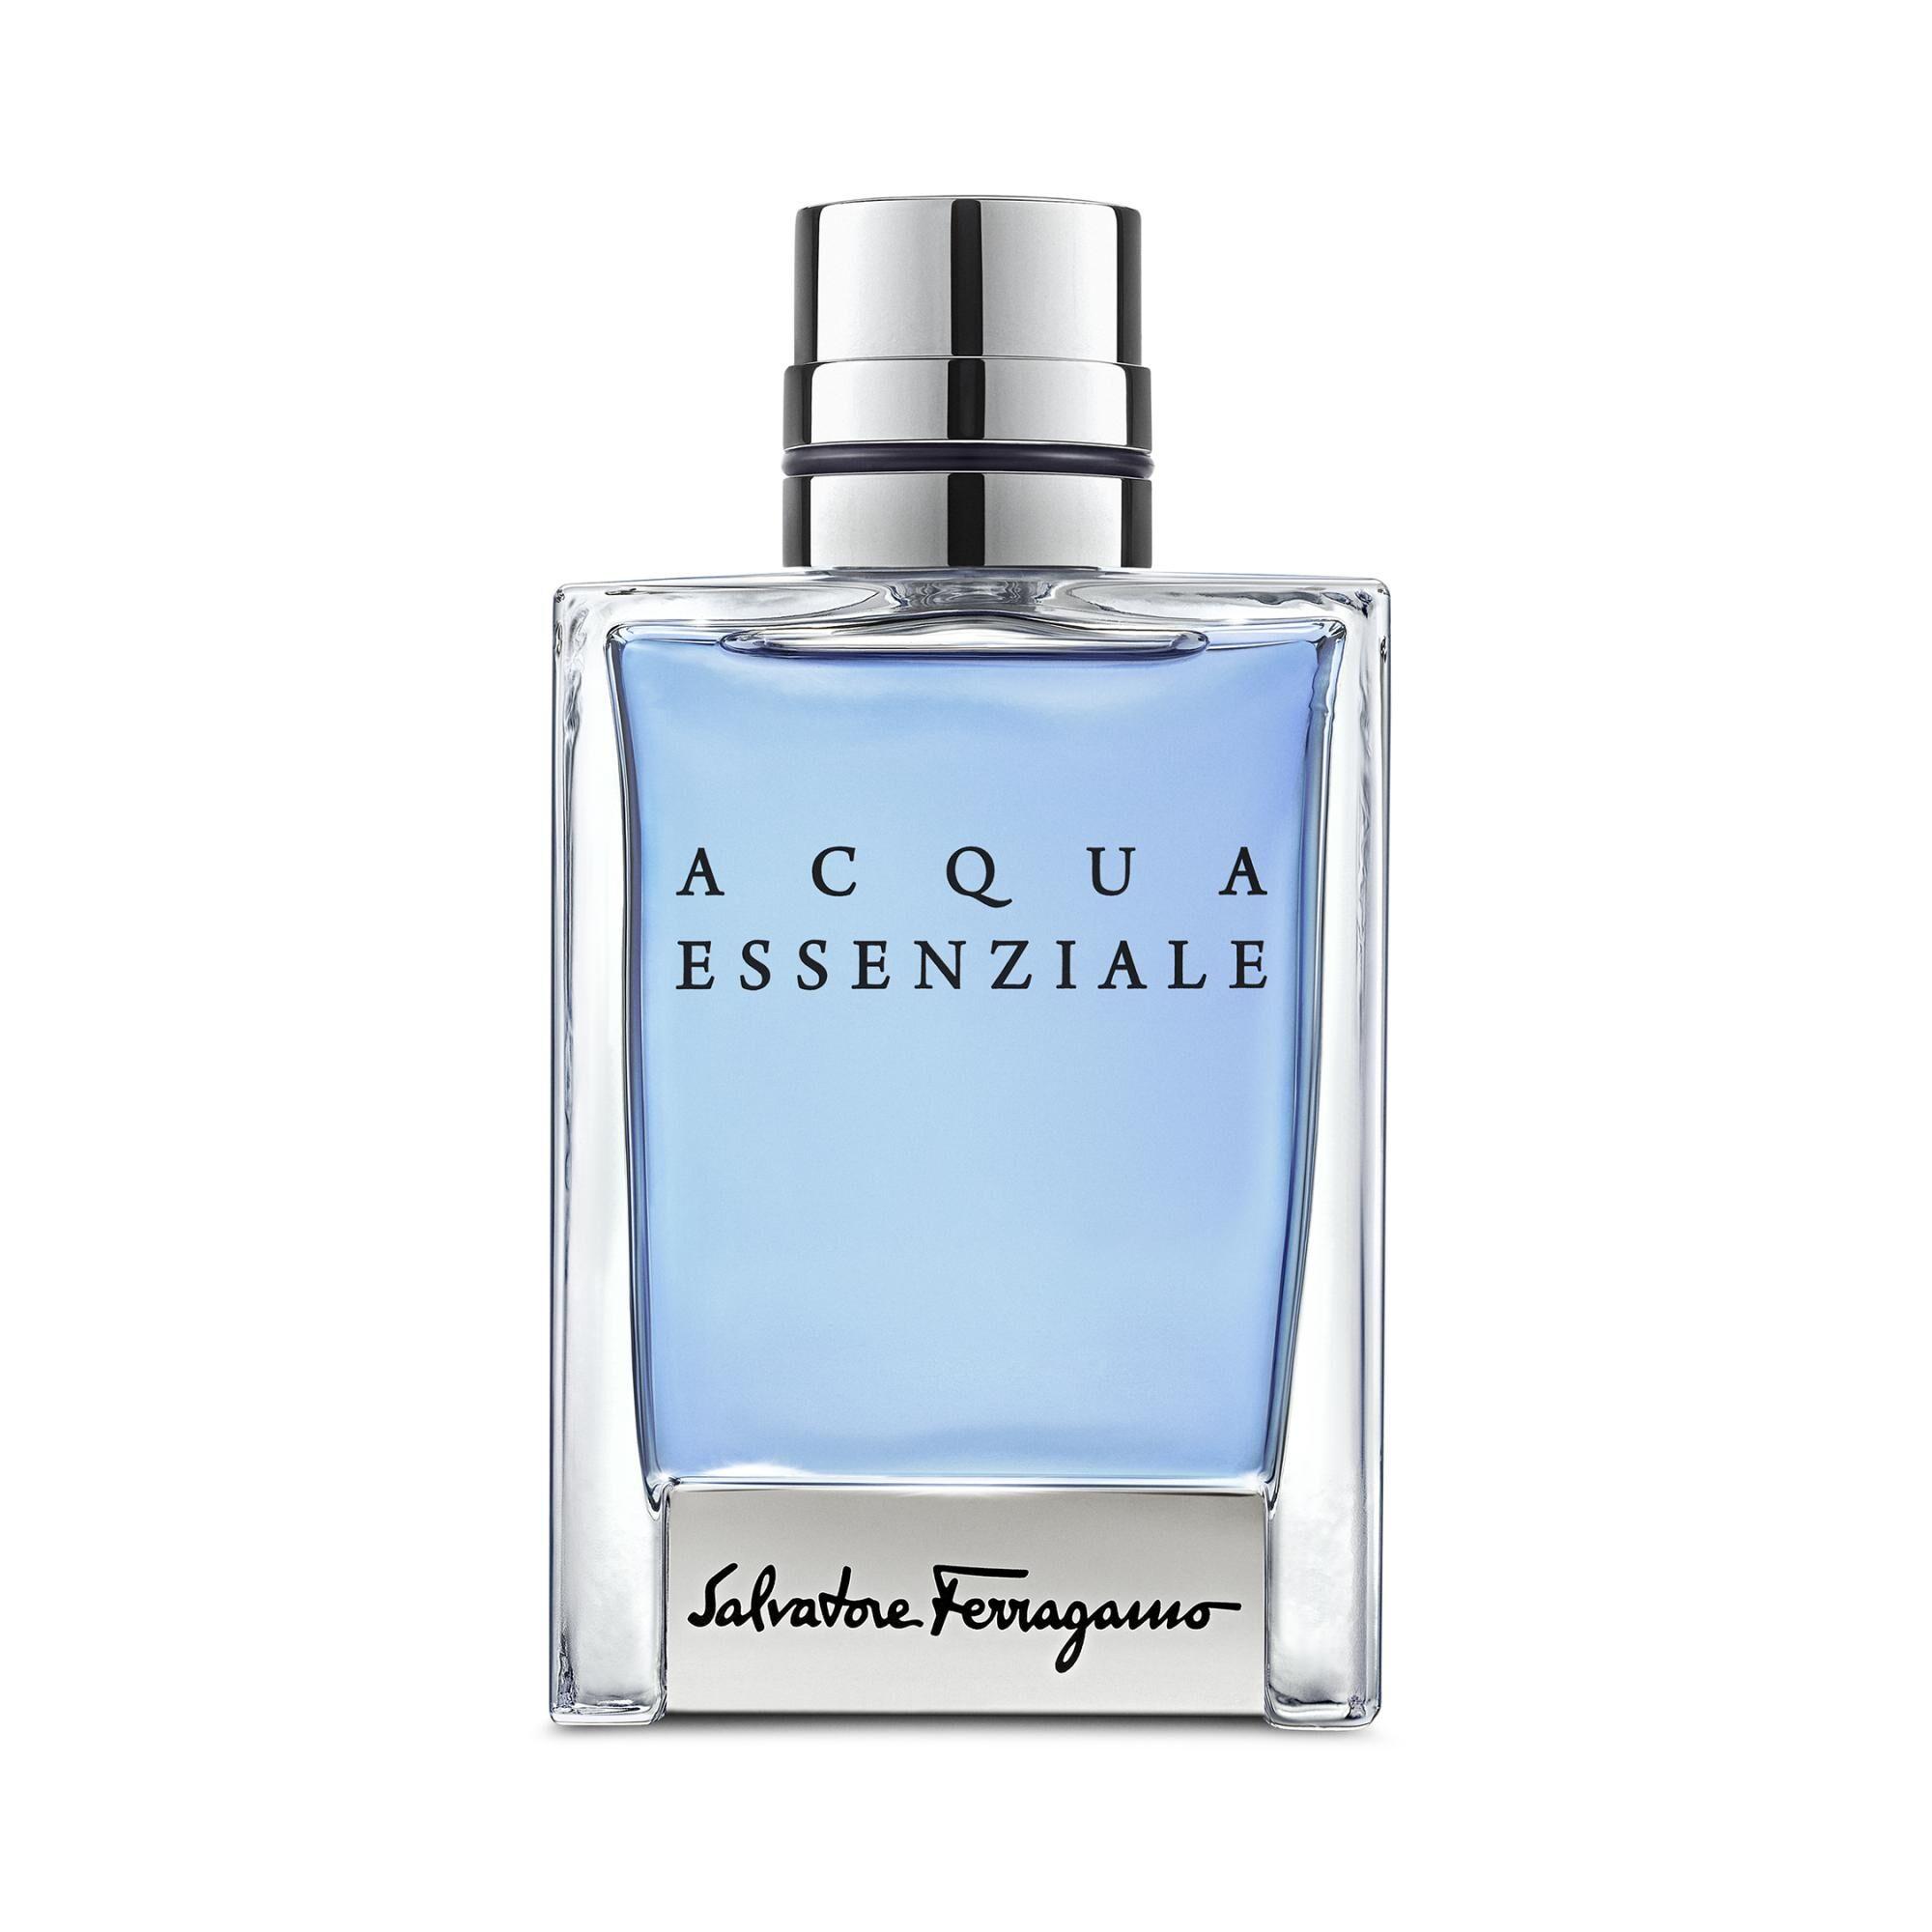 Salvatore Ferragamo Acqua Essenziale eau de toilette 50ml